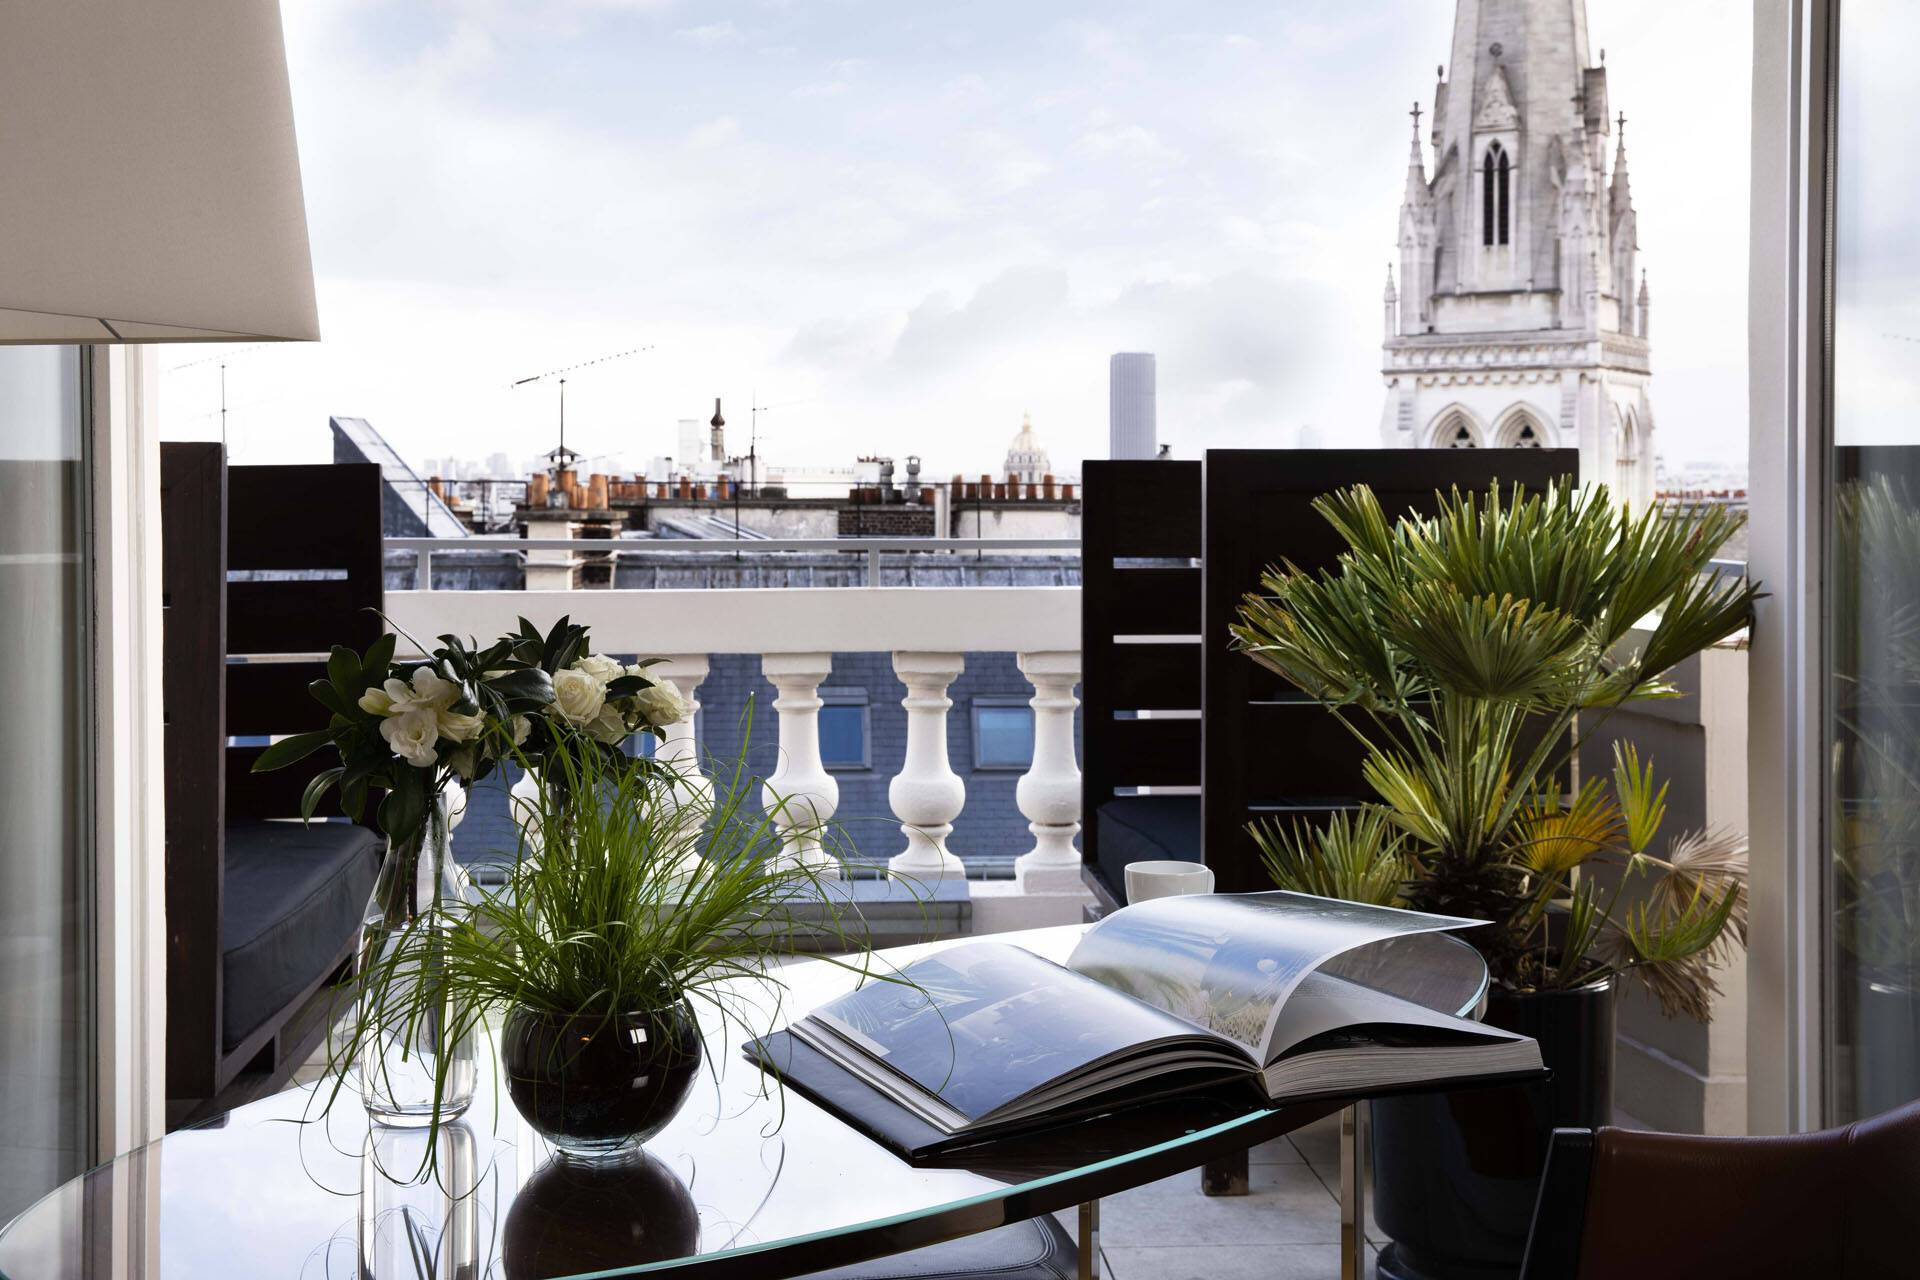 Hotel Sers Paris Chambre 3934